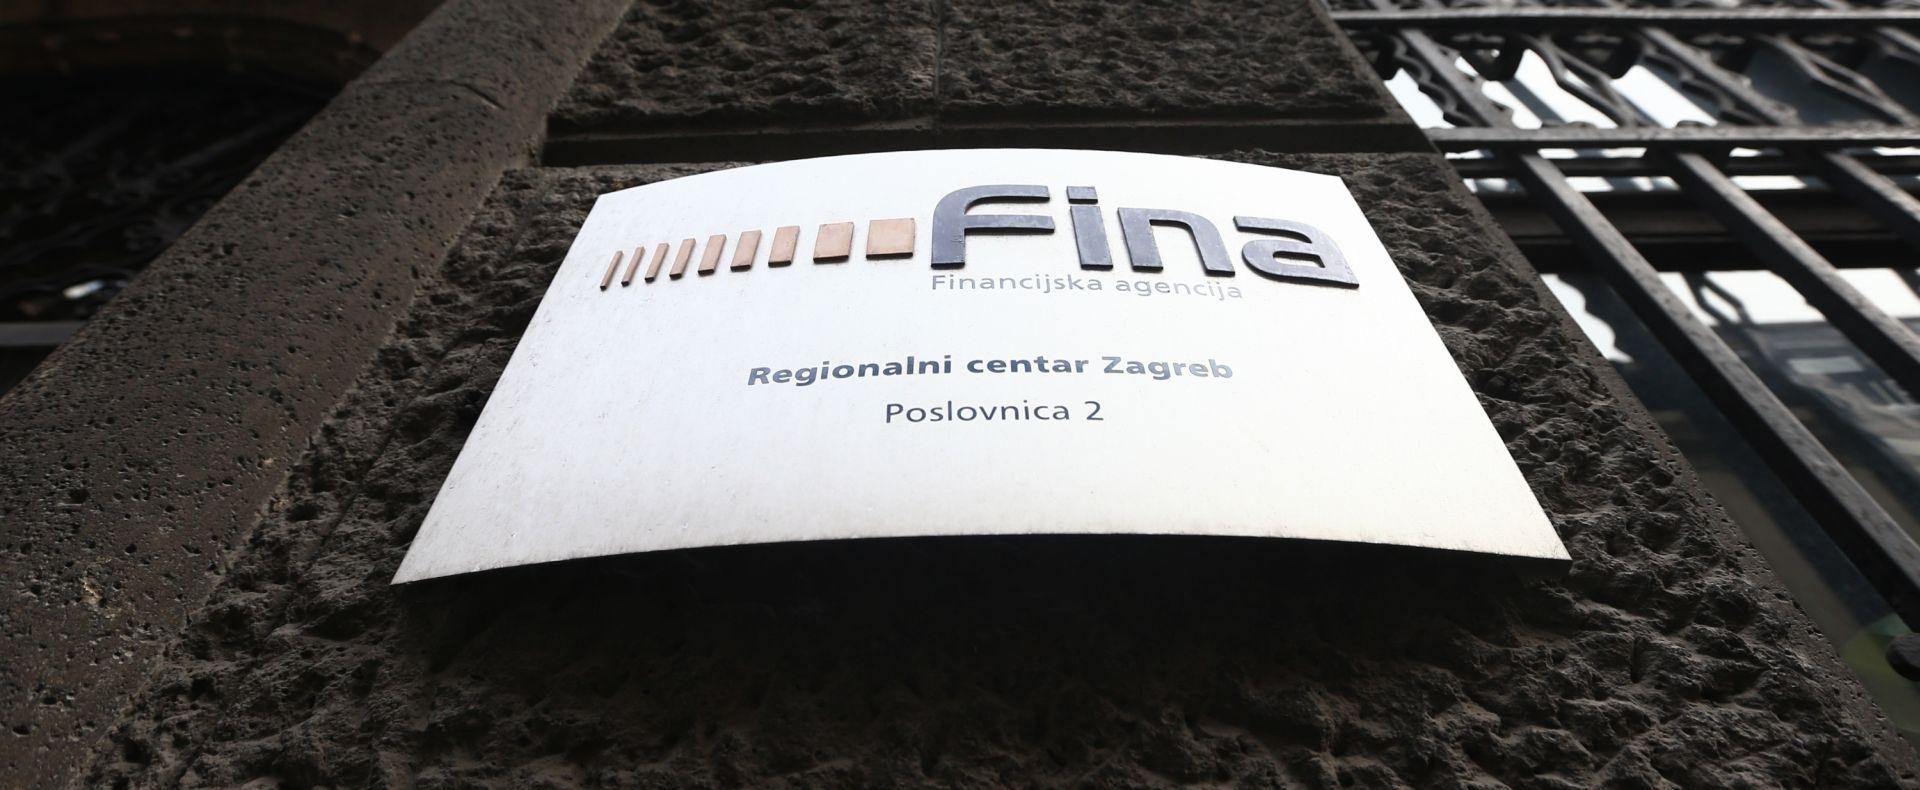 FINA Osobni bankrot zatražilo 686 građana i dva obrtnika